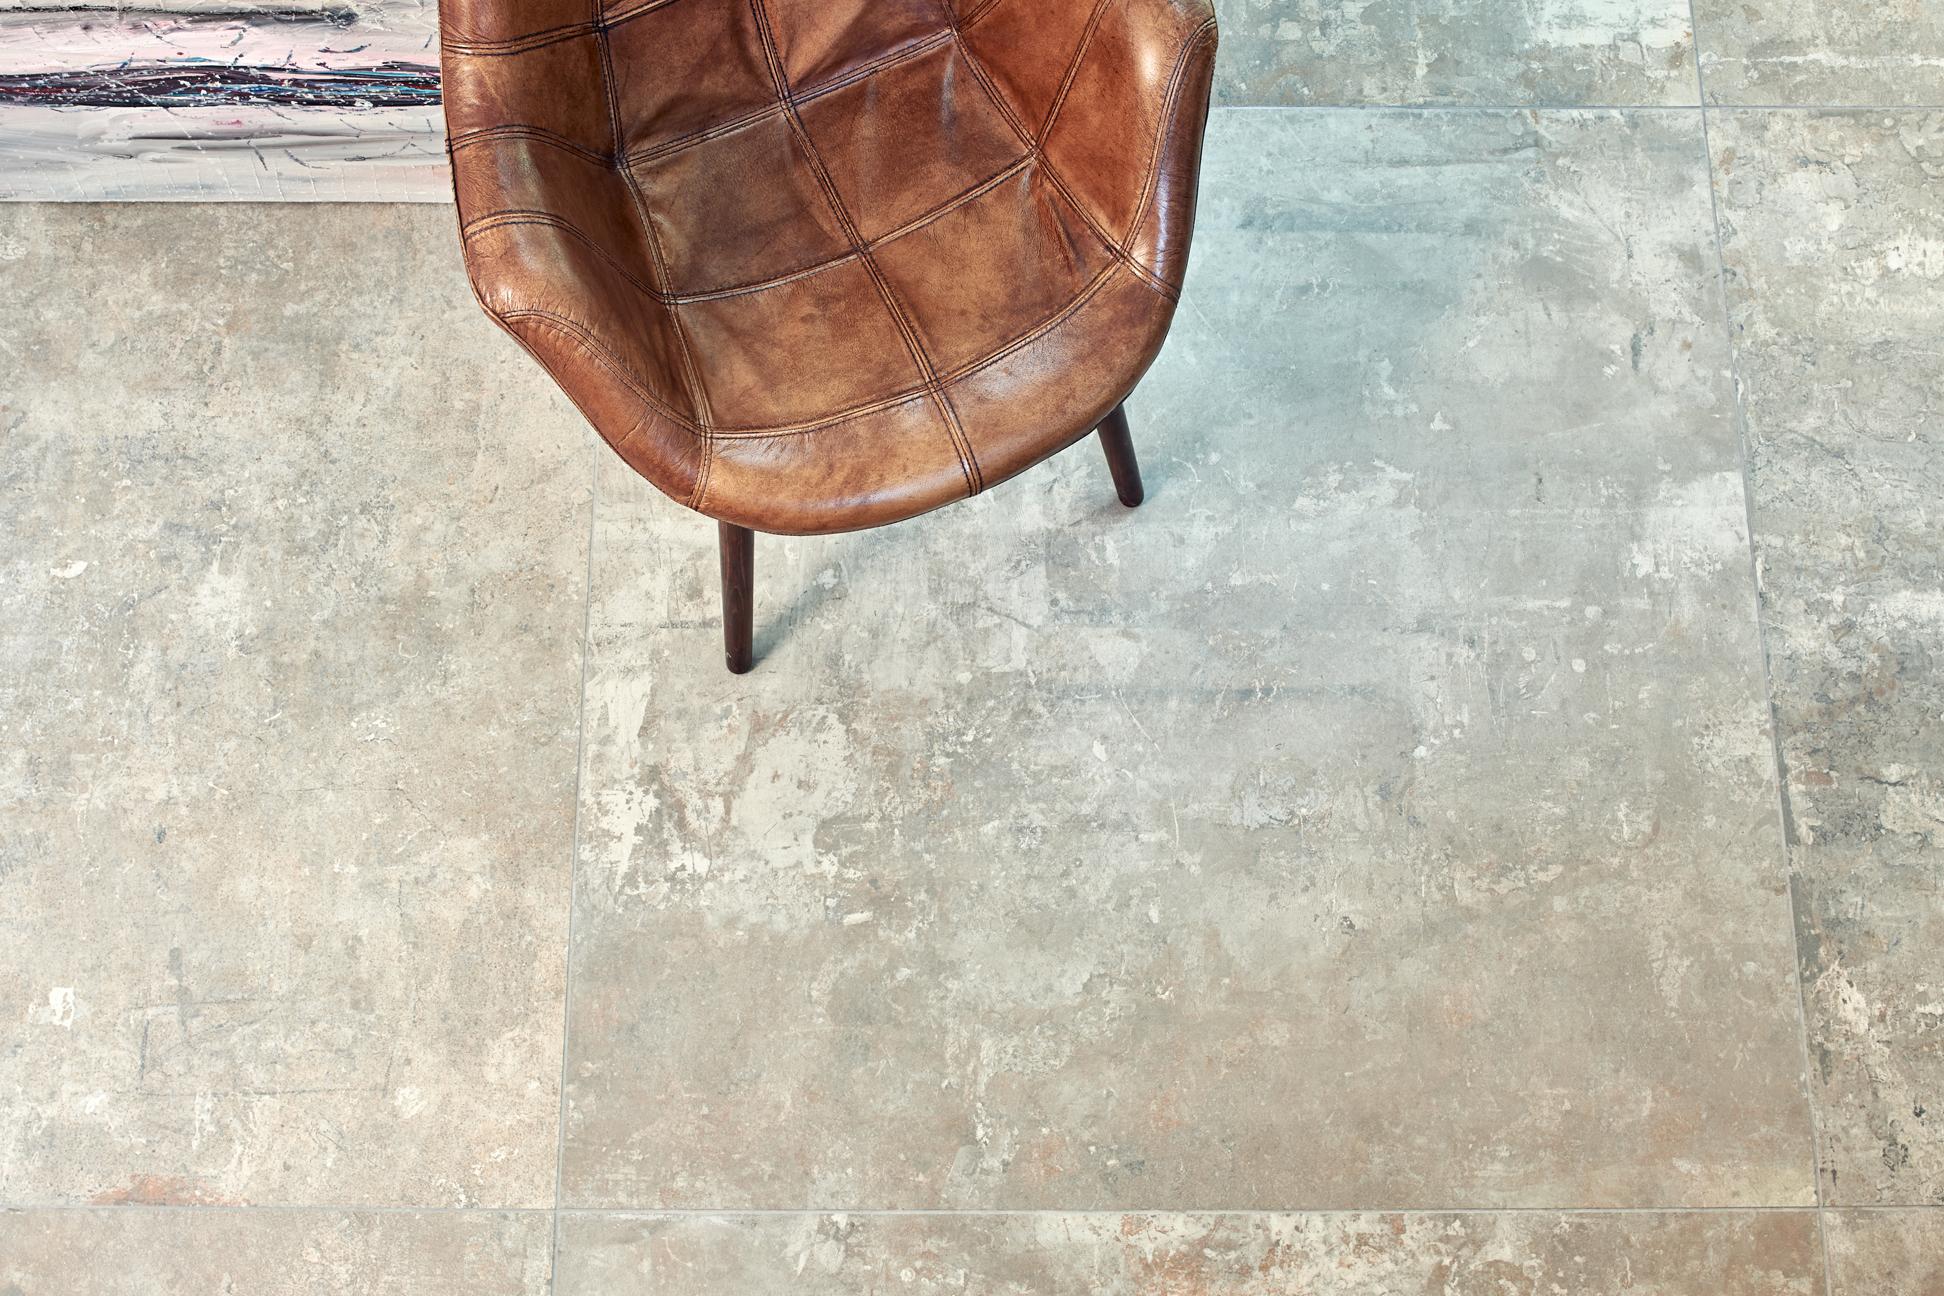 porcelain tile images: Temptation range high quality photo